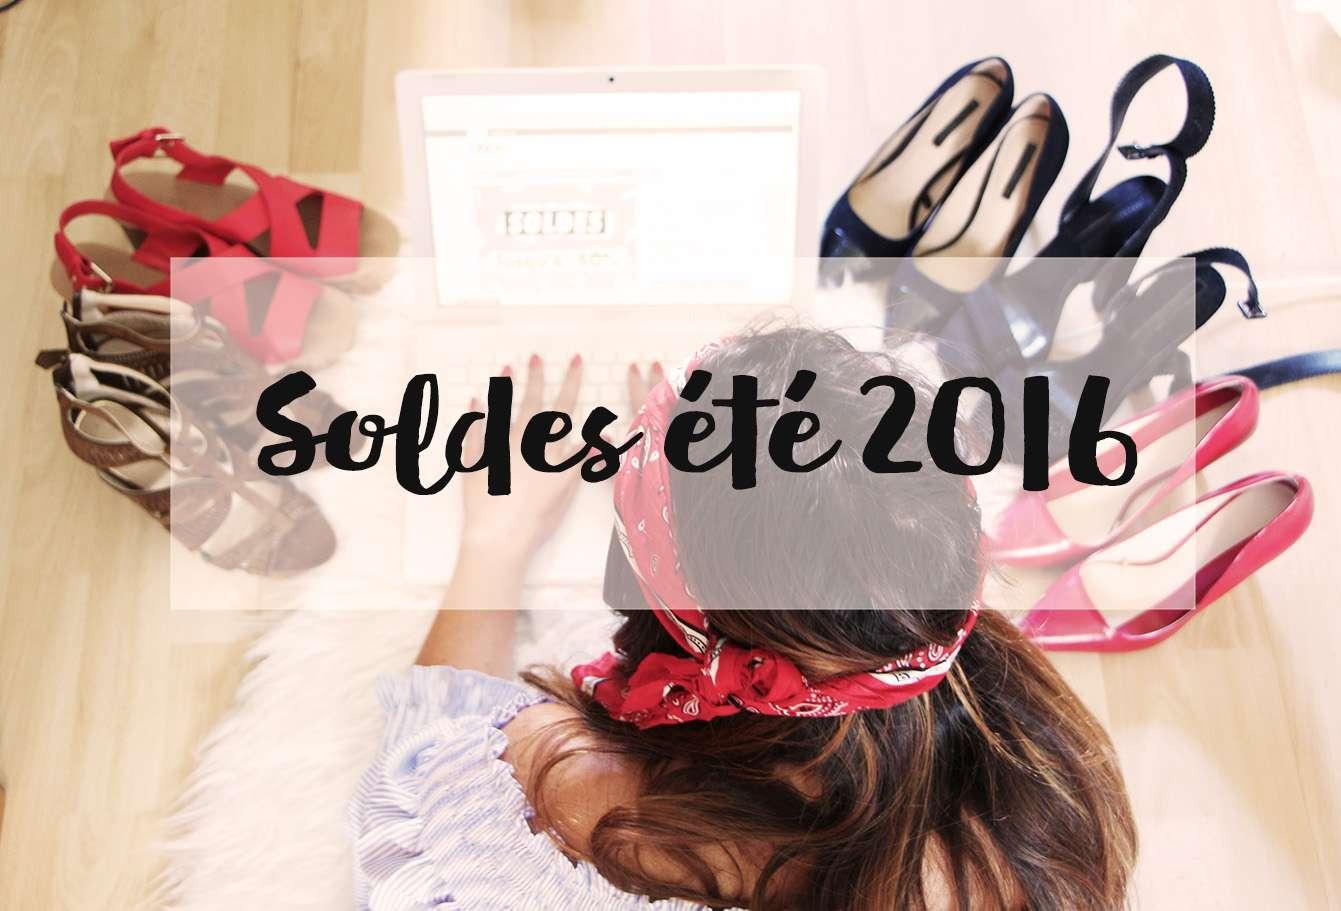 soldes, soldes été 2016, blog mode, blogueuse mode, french bloffer, mode, ma sélection soldes été 2016, , shopping, zara, chaussures, bons plans, dressing, promo zara, asos, pull and bear